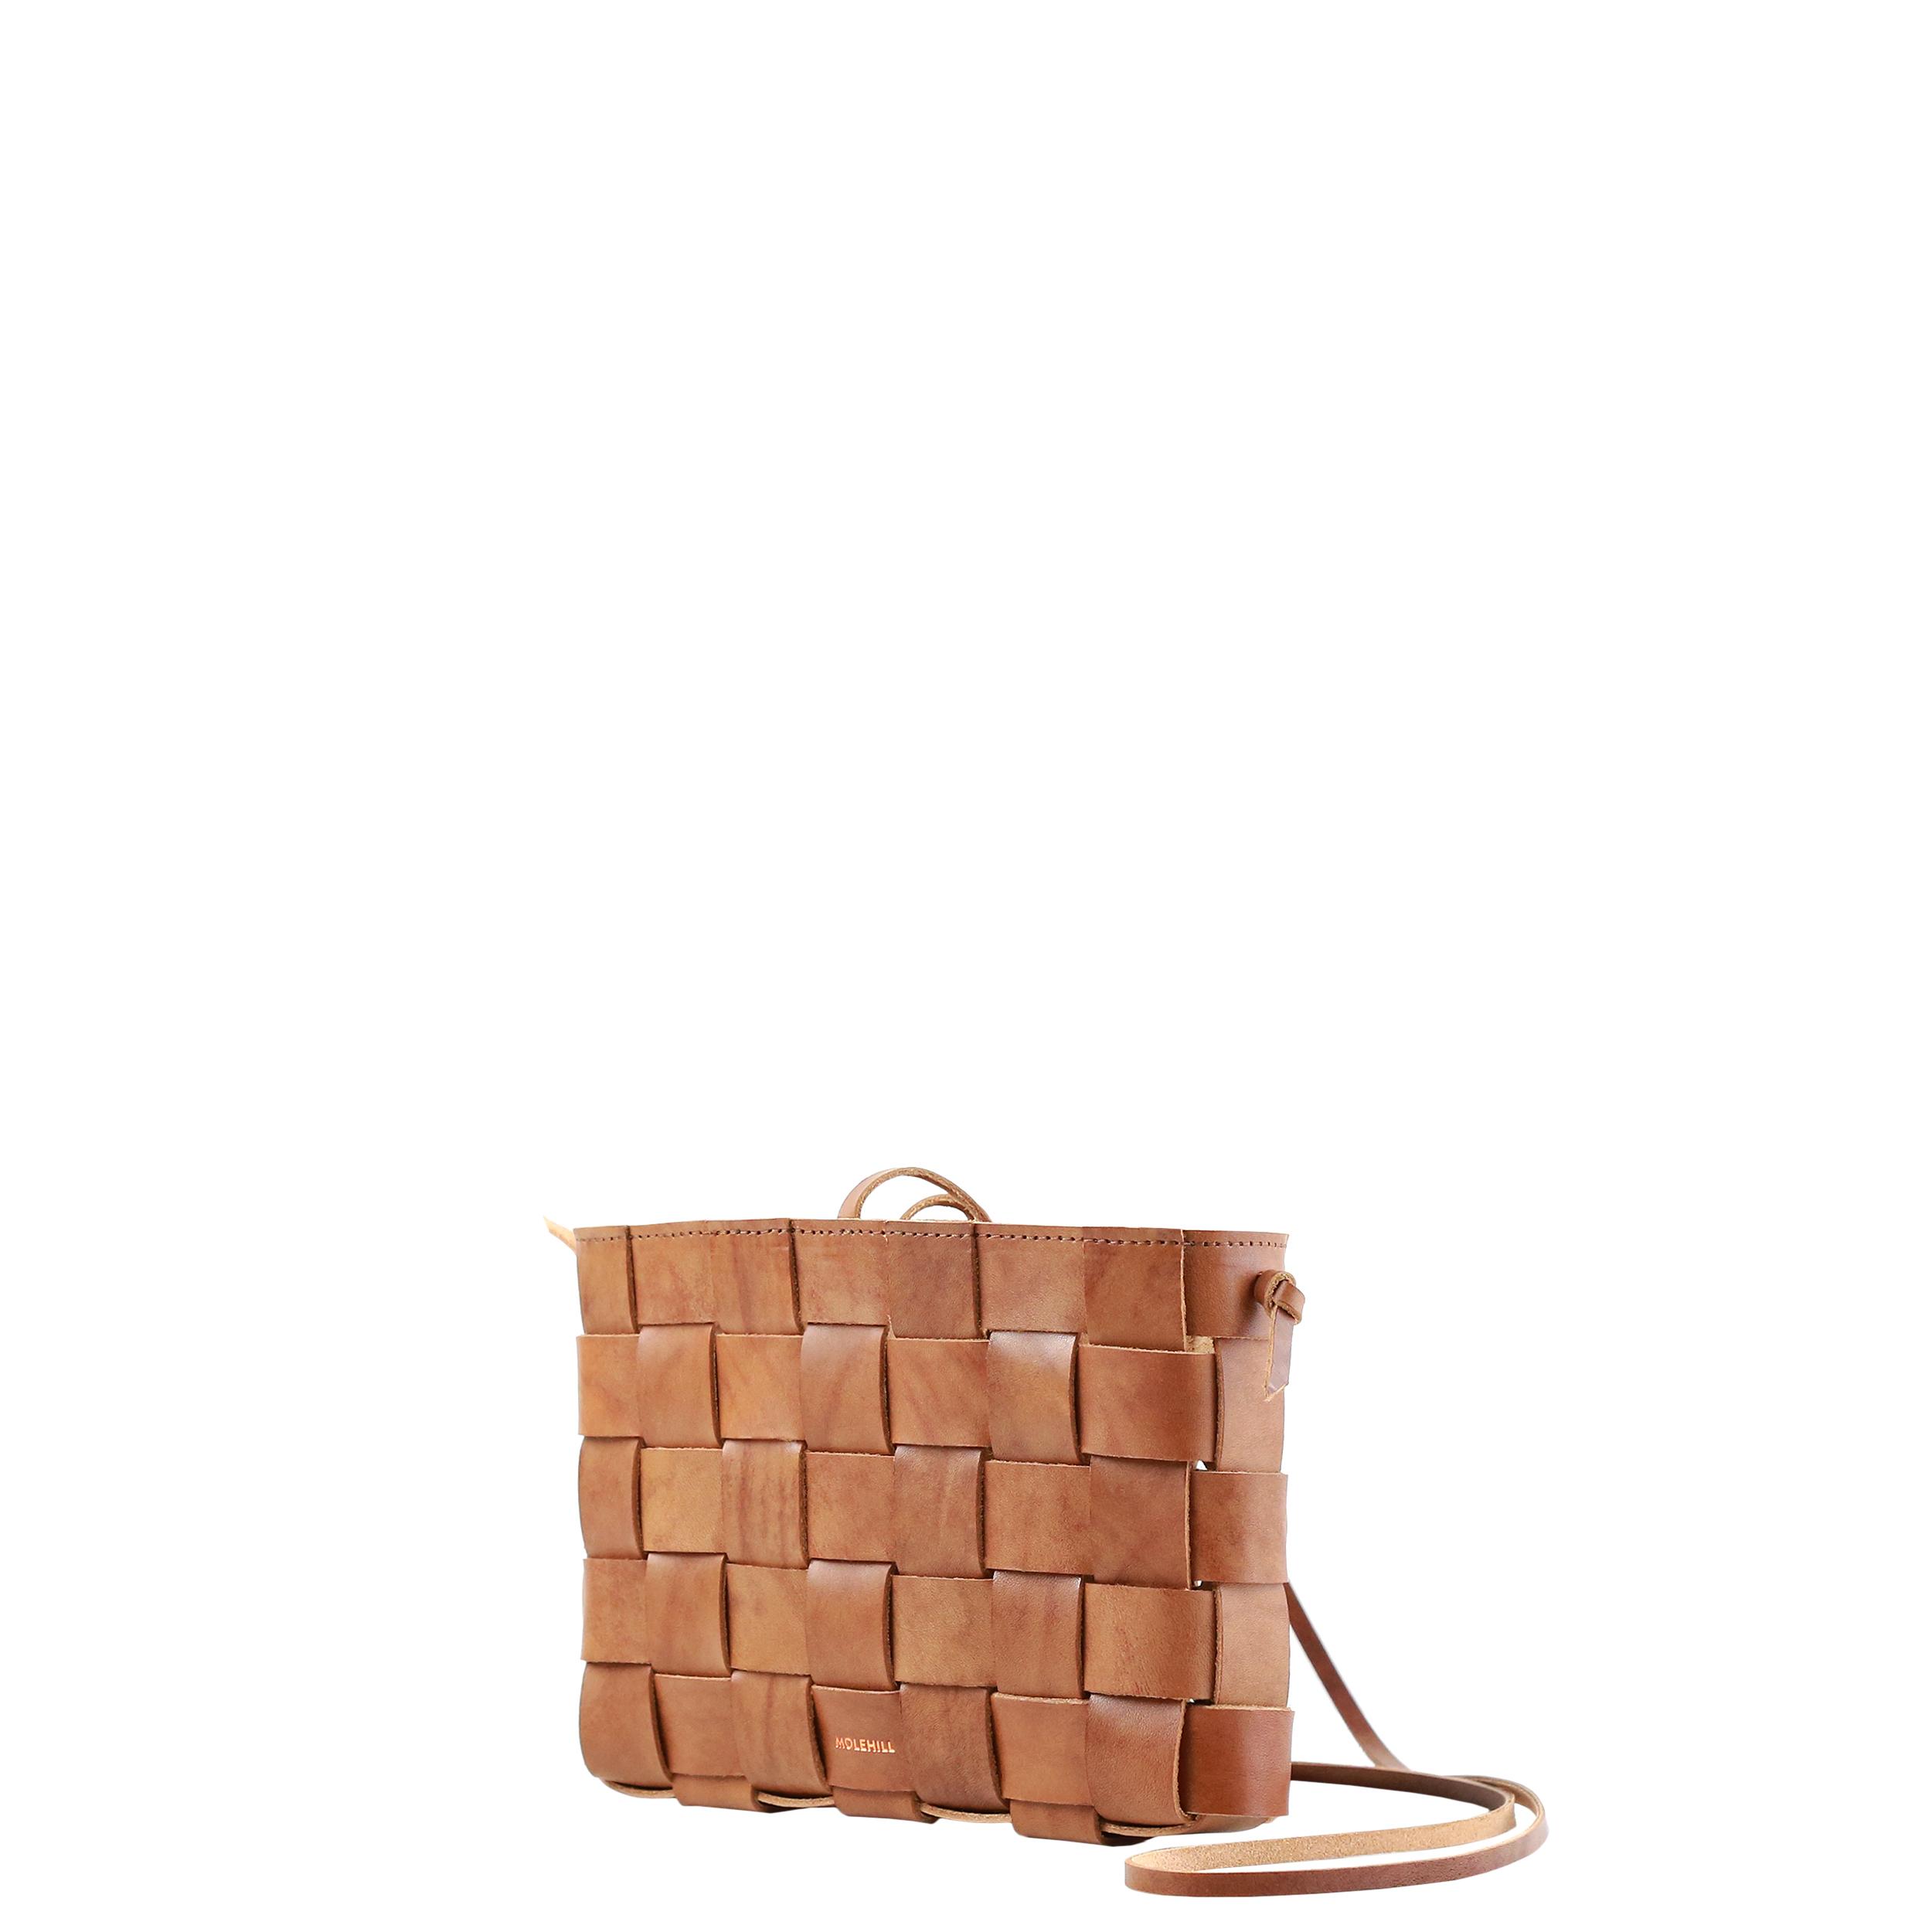 Pane Crossbody Woven Bag Wild-2